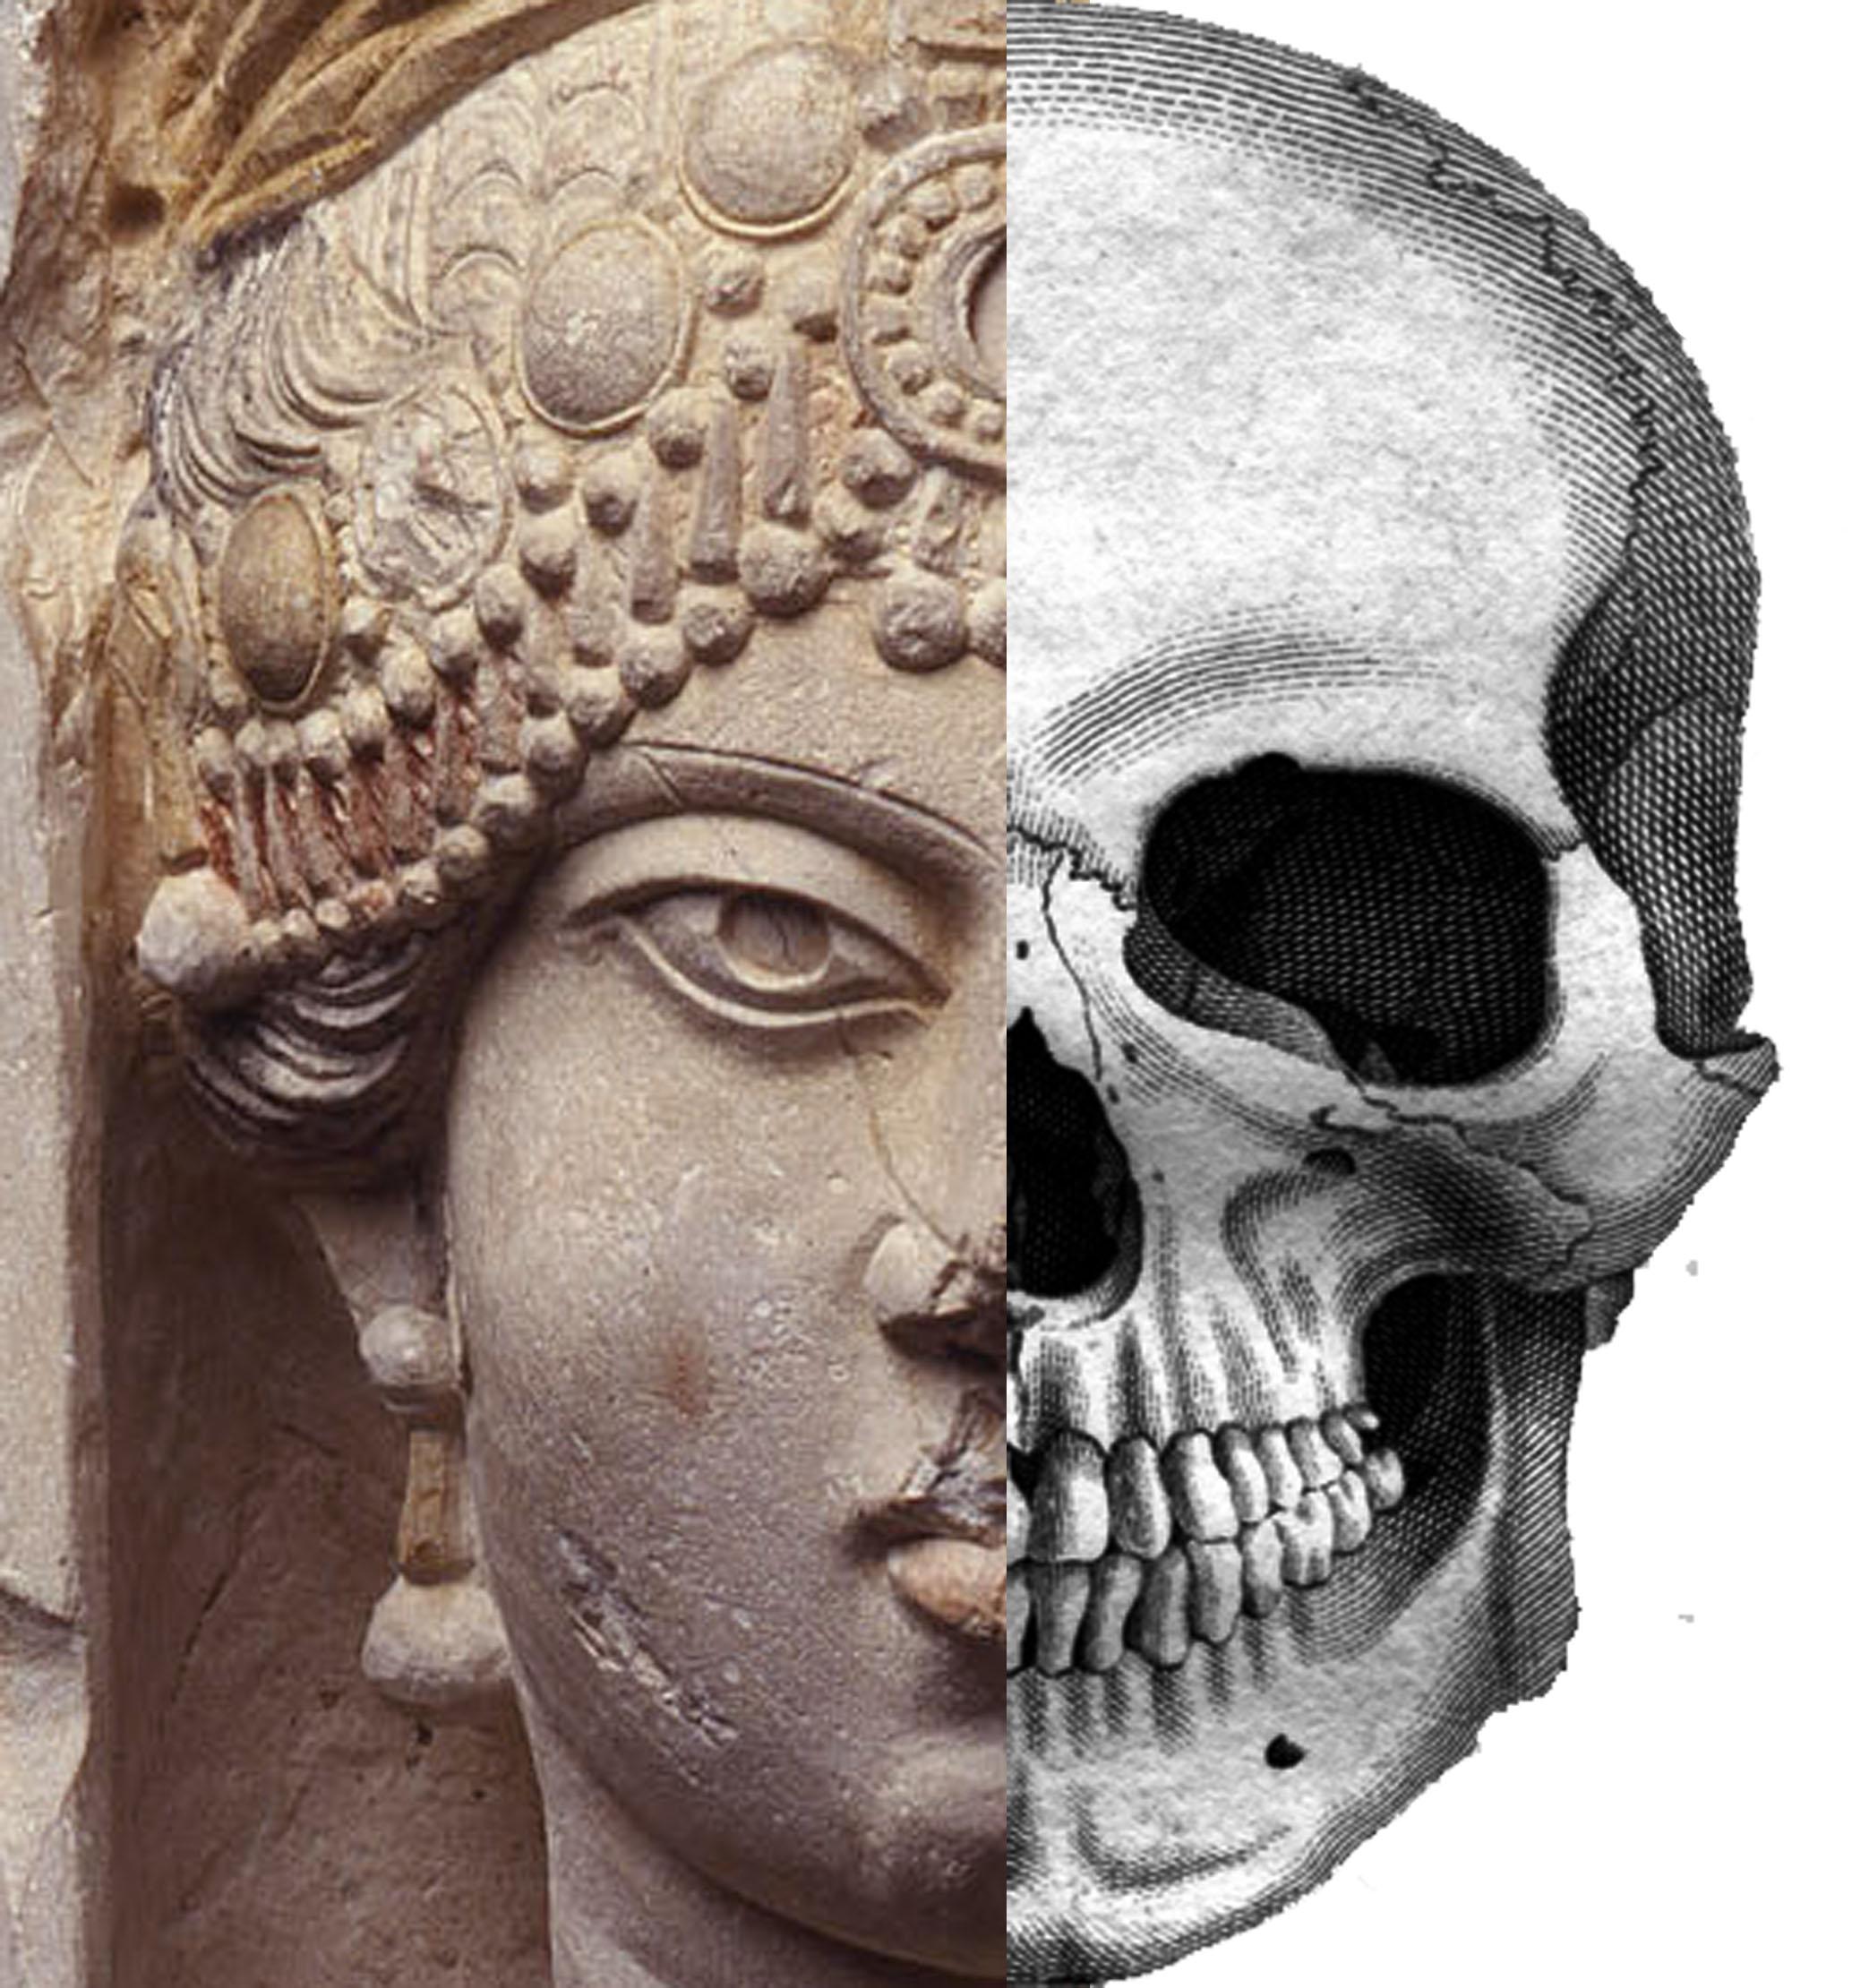 Curs Arqueologia funerària